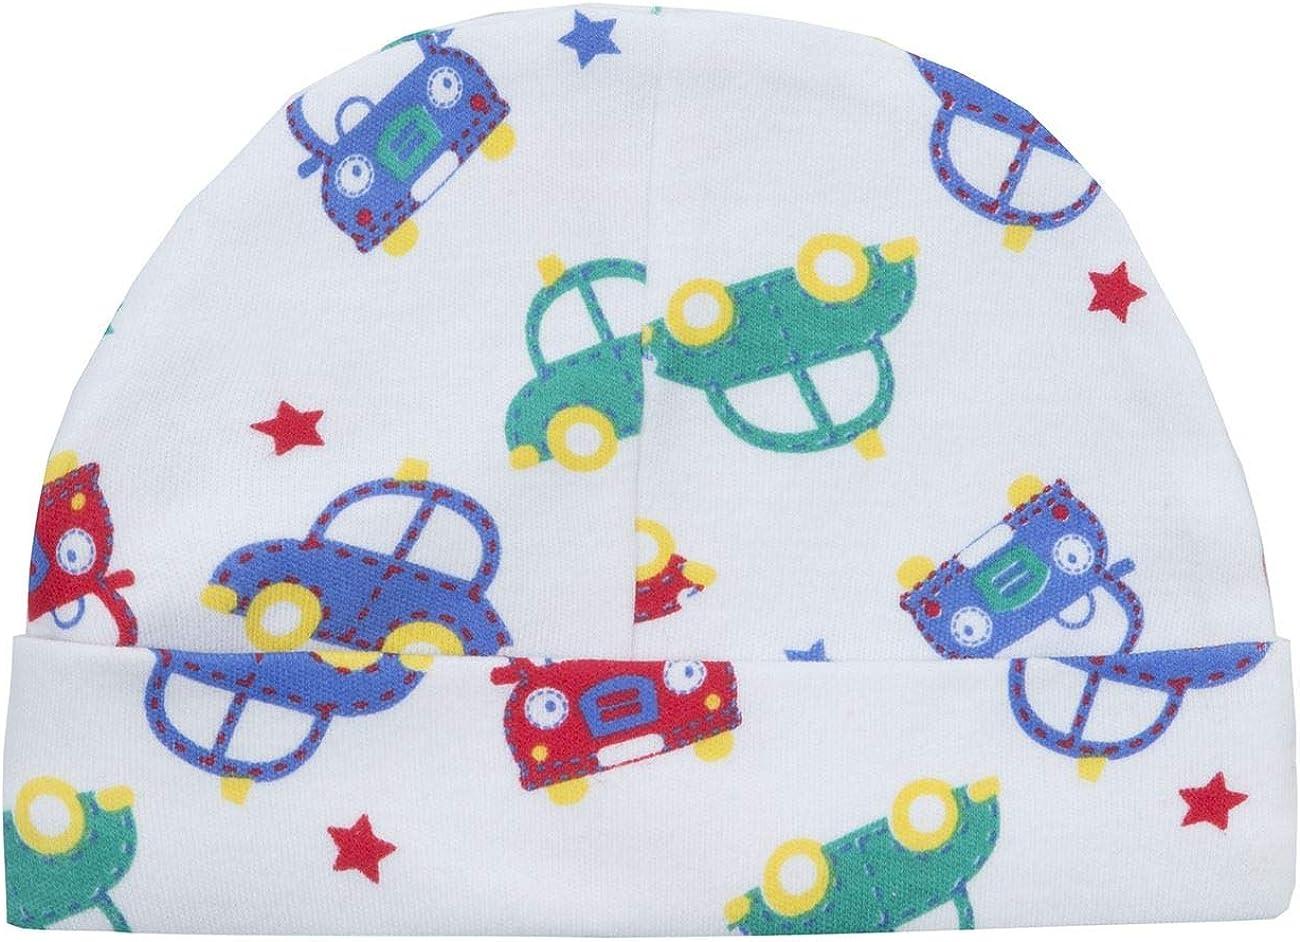 Style It Up Babies Baby Boys Sleepsuit Bib Hat Babygrow All in One Newborn Gift 3pc Set Cute